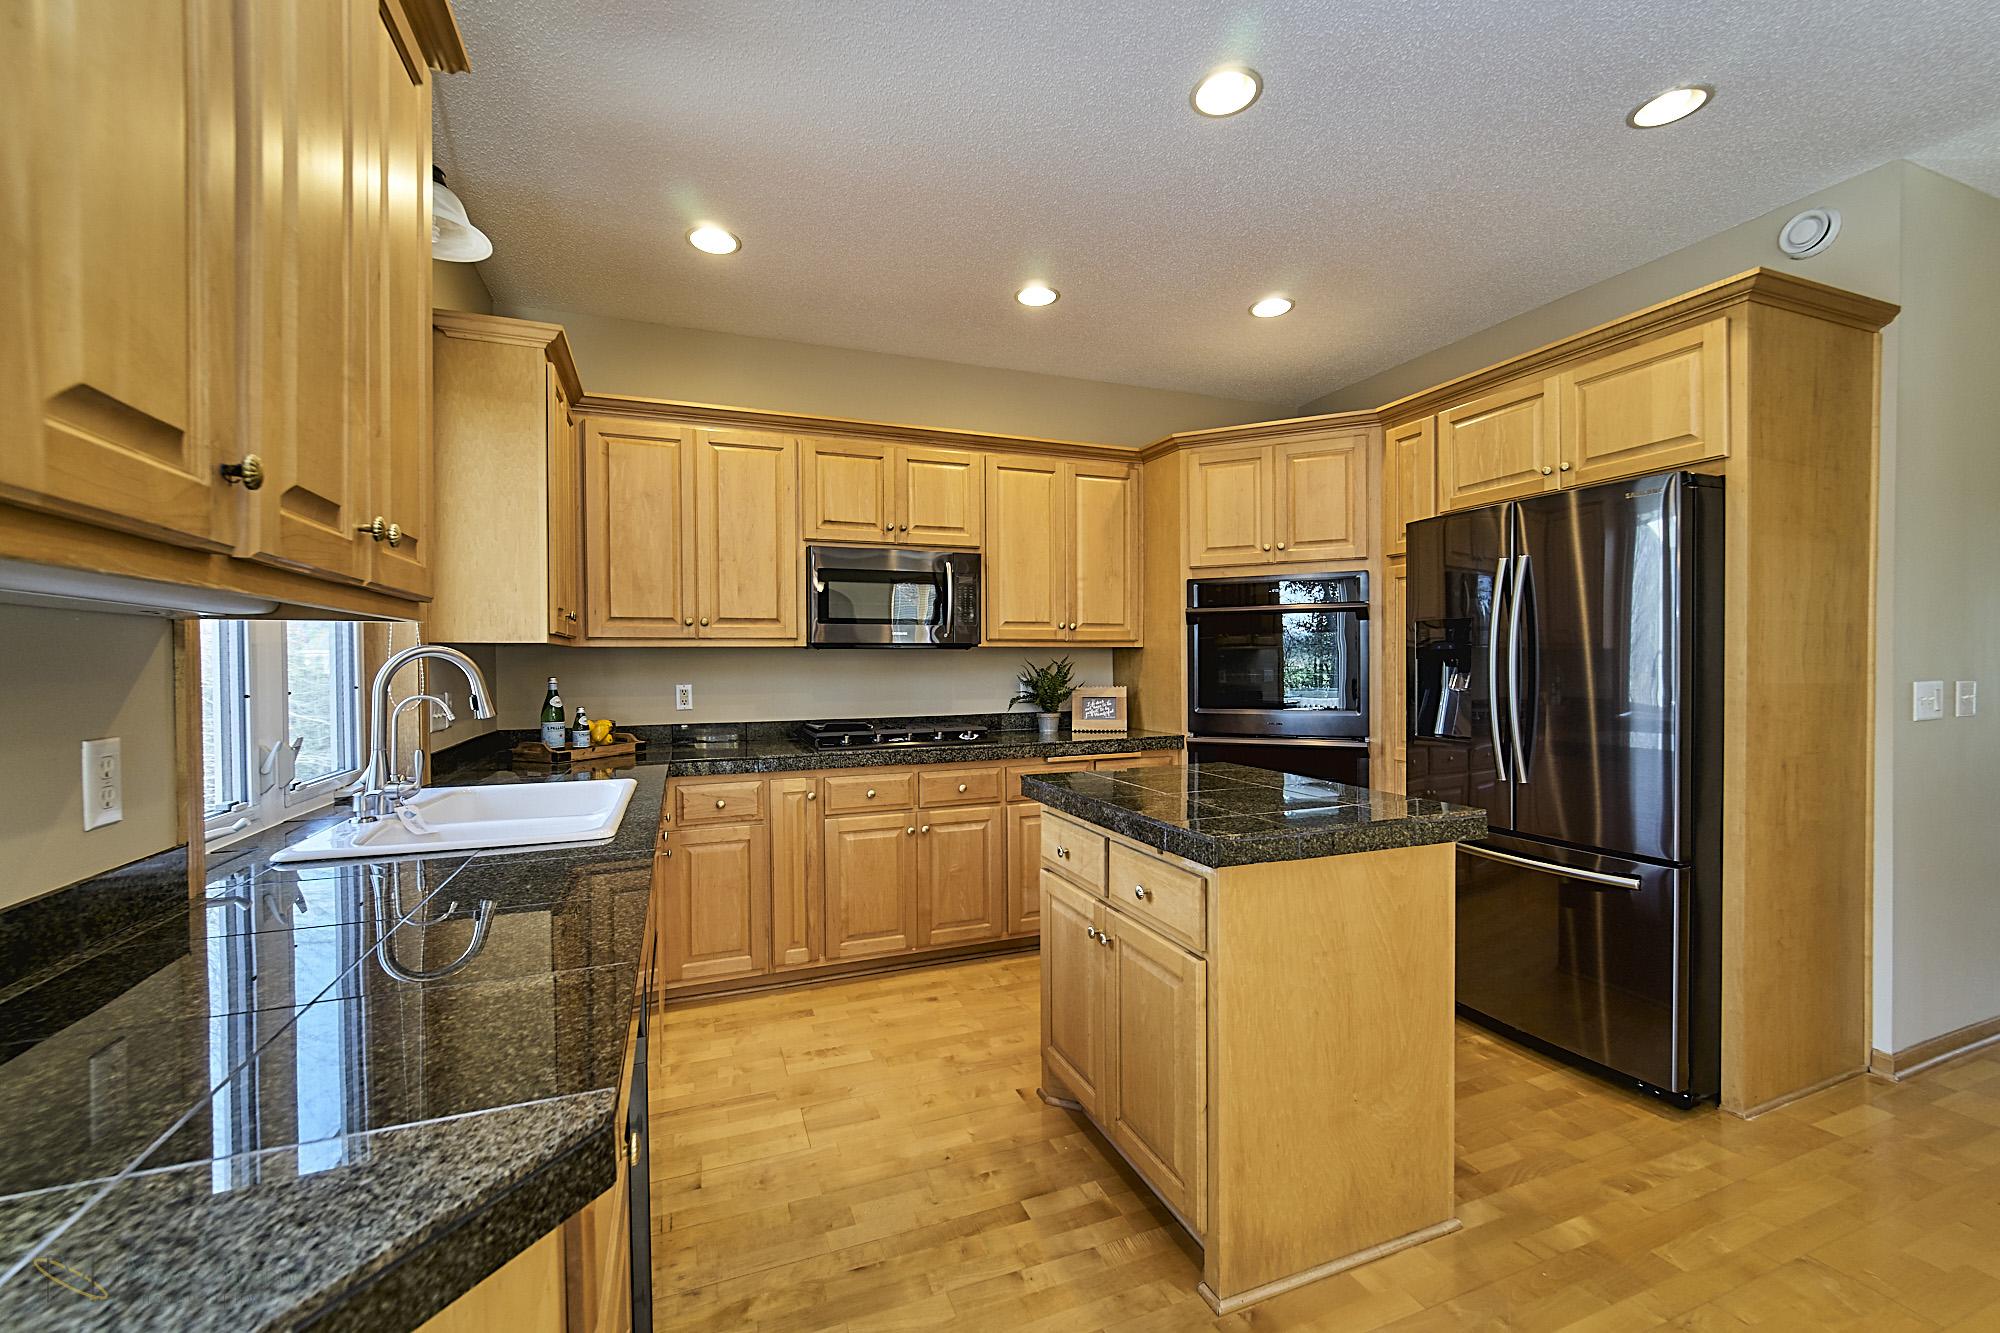 13770-Cottonwood-St-NW-Andover 10 kitchen.jpg